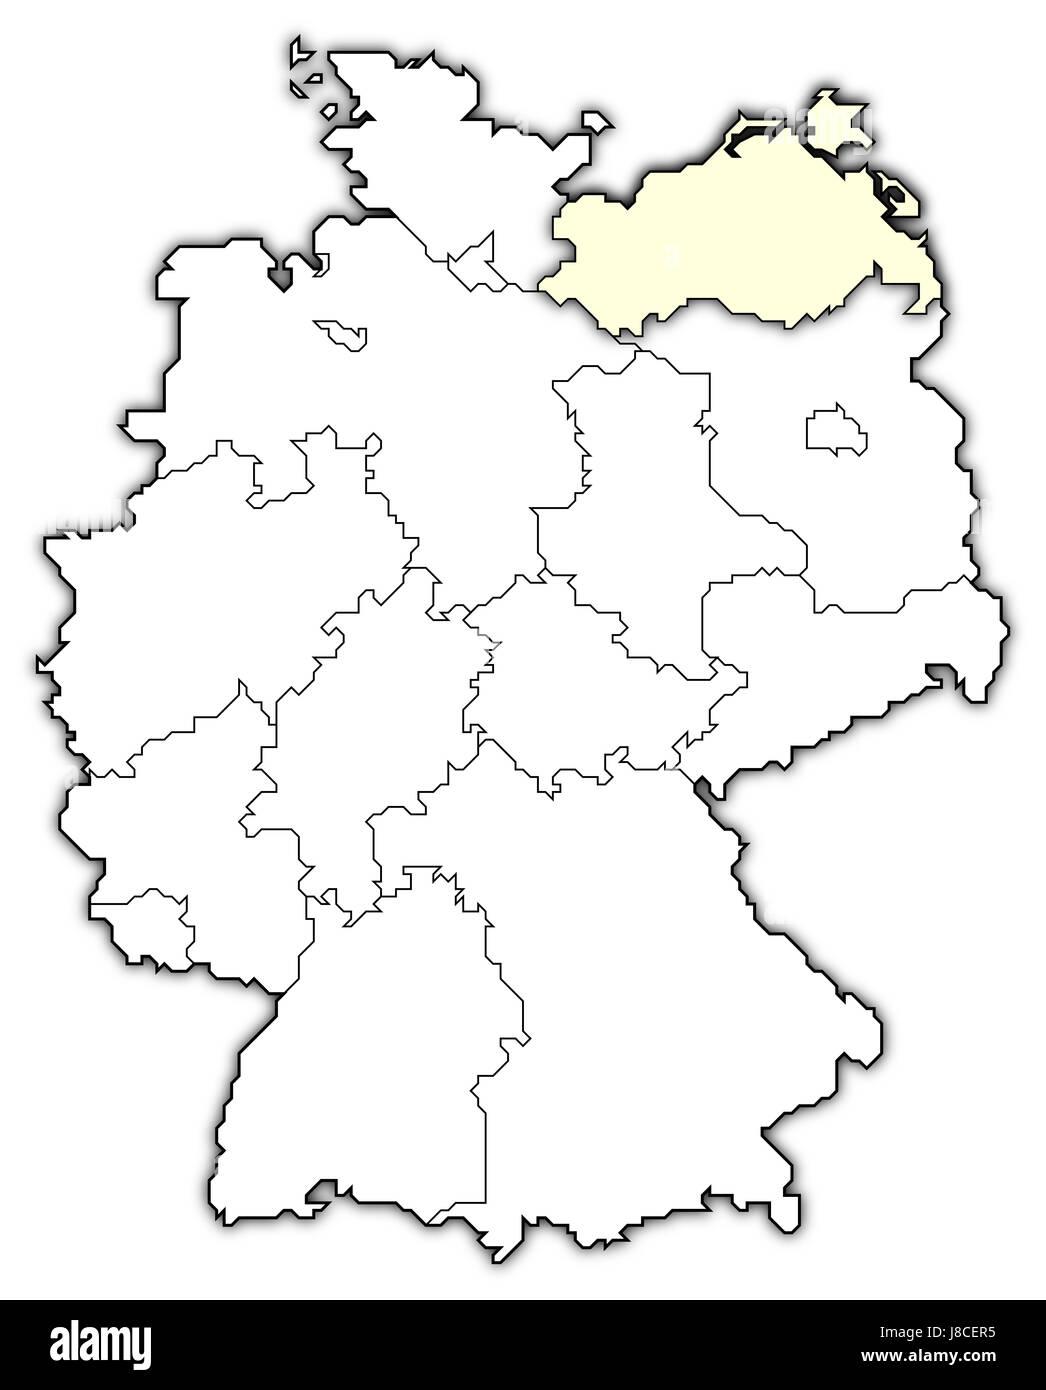 map of germany,mecklenburg-vorpommern highlighted - Stock Image